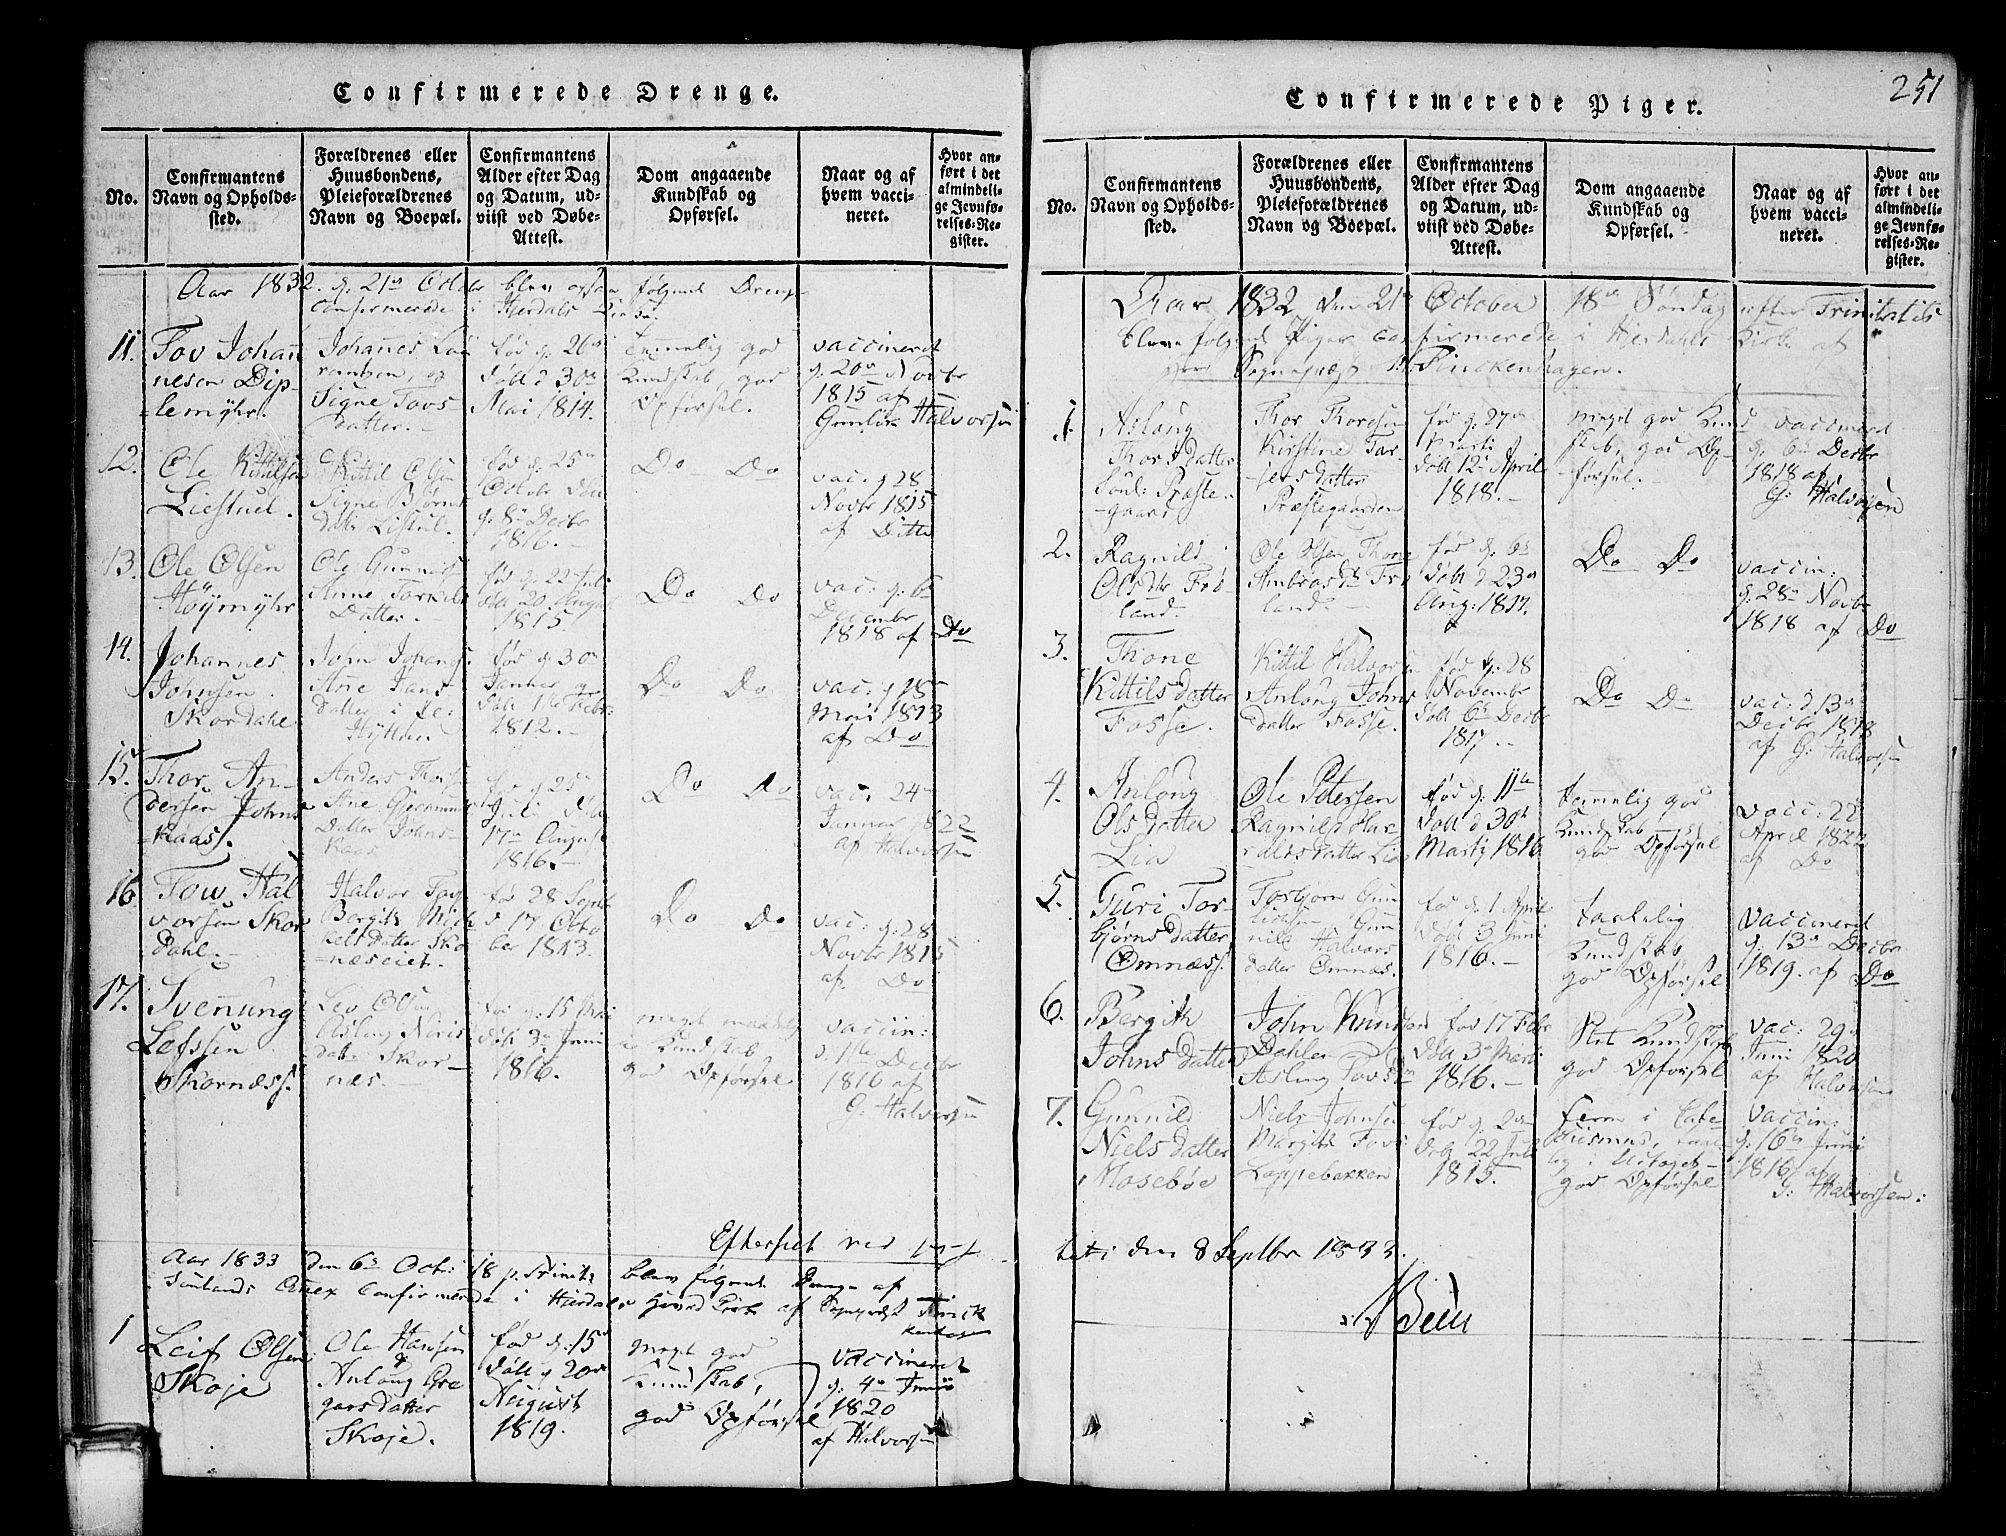 SAKO, Hjartdal kirkebøker, G/Gb/L0001: Klokkerbok nr. II 1, 1815-1842, s. 251